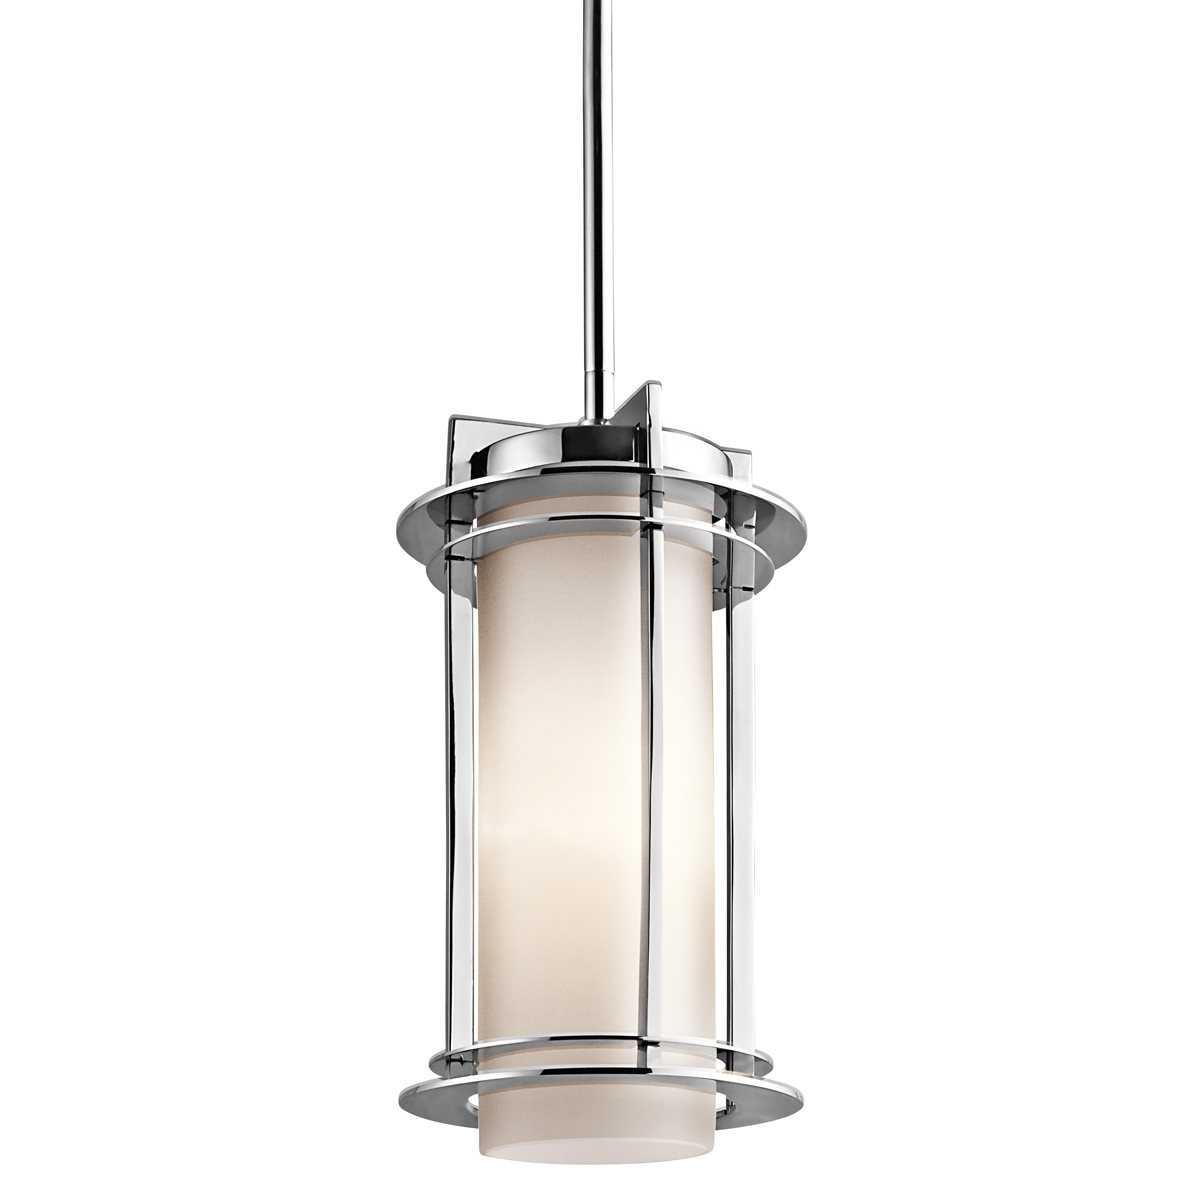 Inspiration about Modern Outdoor Ceiling Light, Modern Outdoor Ceiling Light Intended For Modern Outdoor Ceiling Lights (#6 of 15)